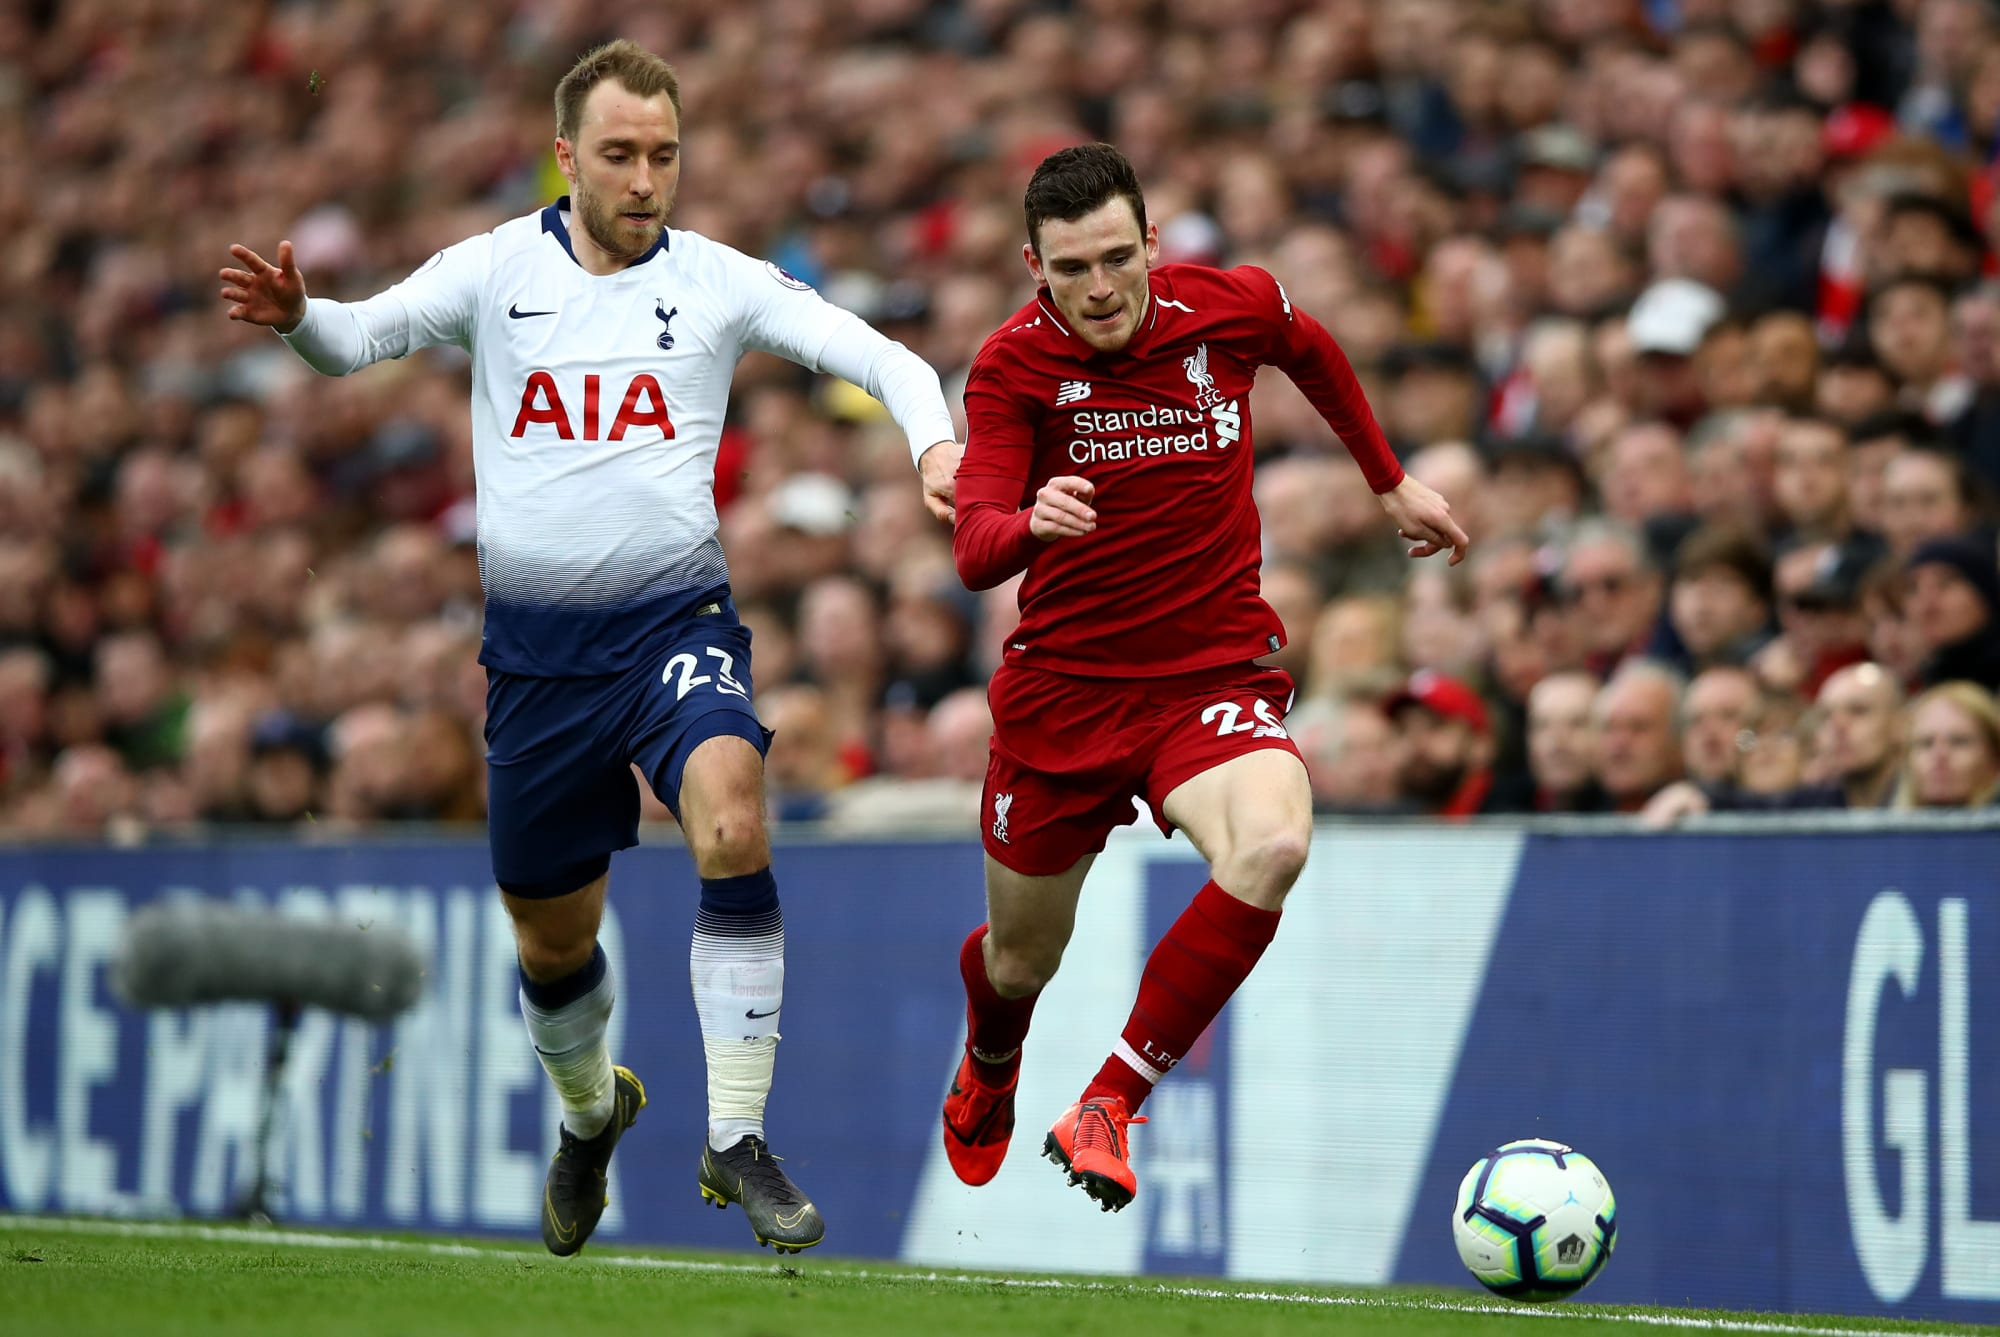 Liverpool Tottenham Live Stream Free